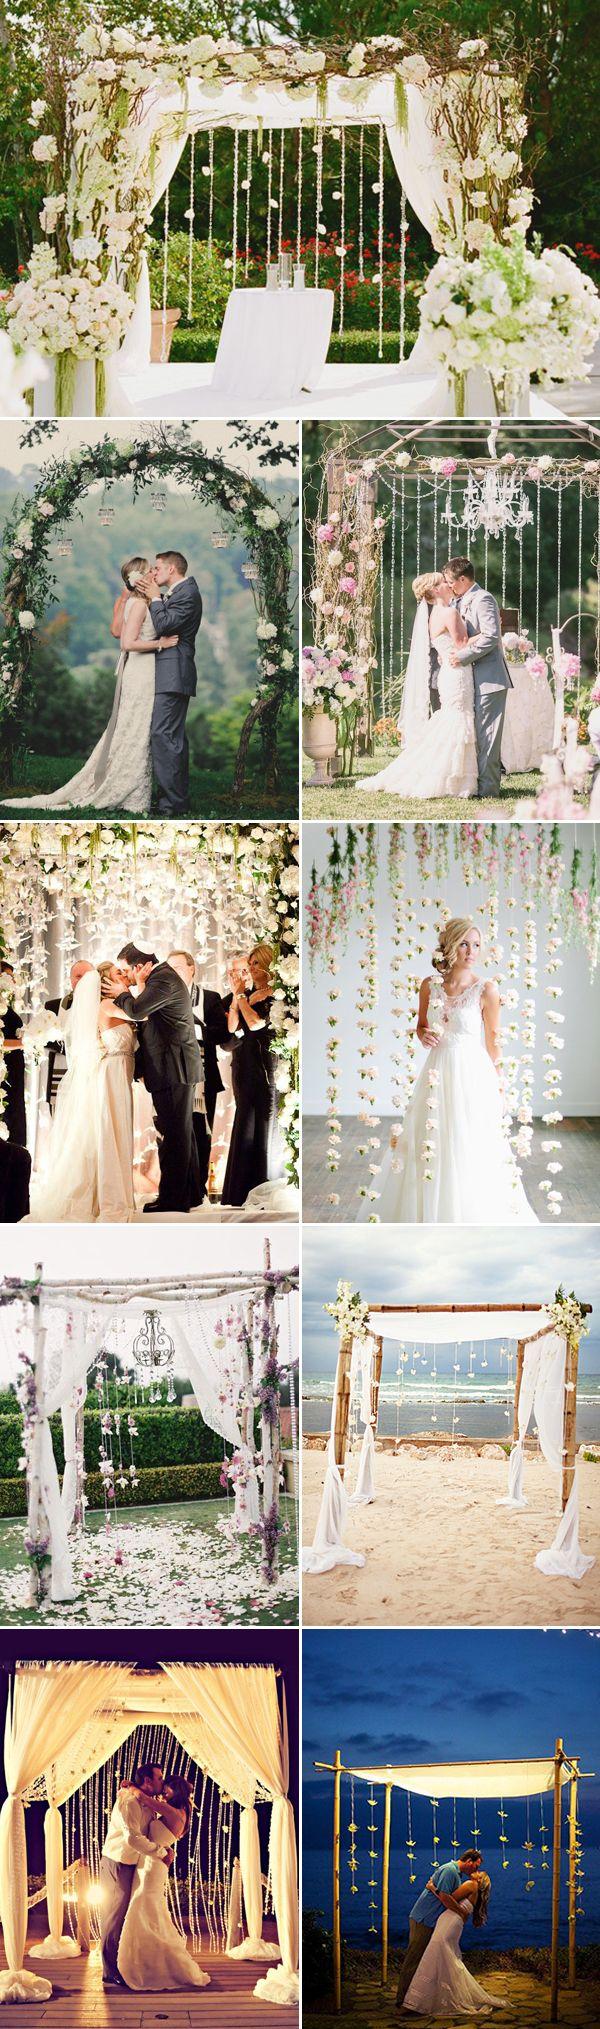 Barrell Wedding Decor Wedding Ideas We Are Currently Loving Coronet Diamonds